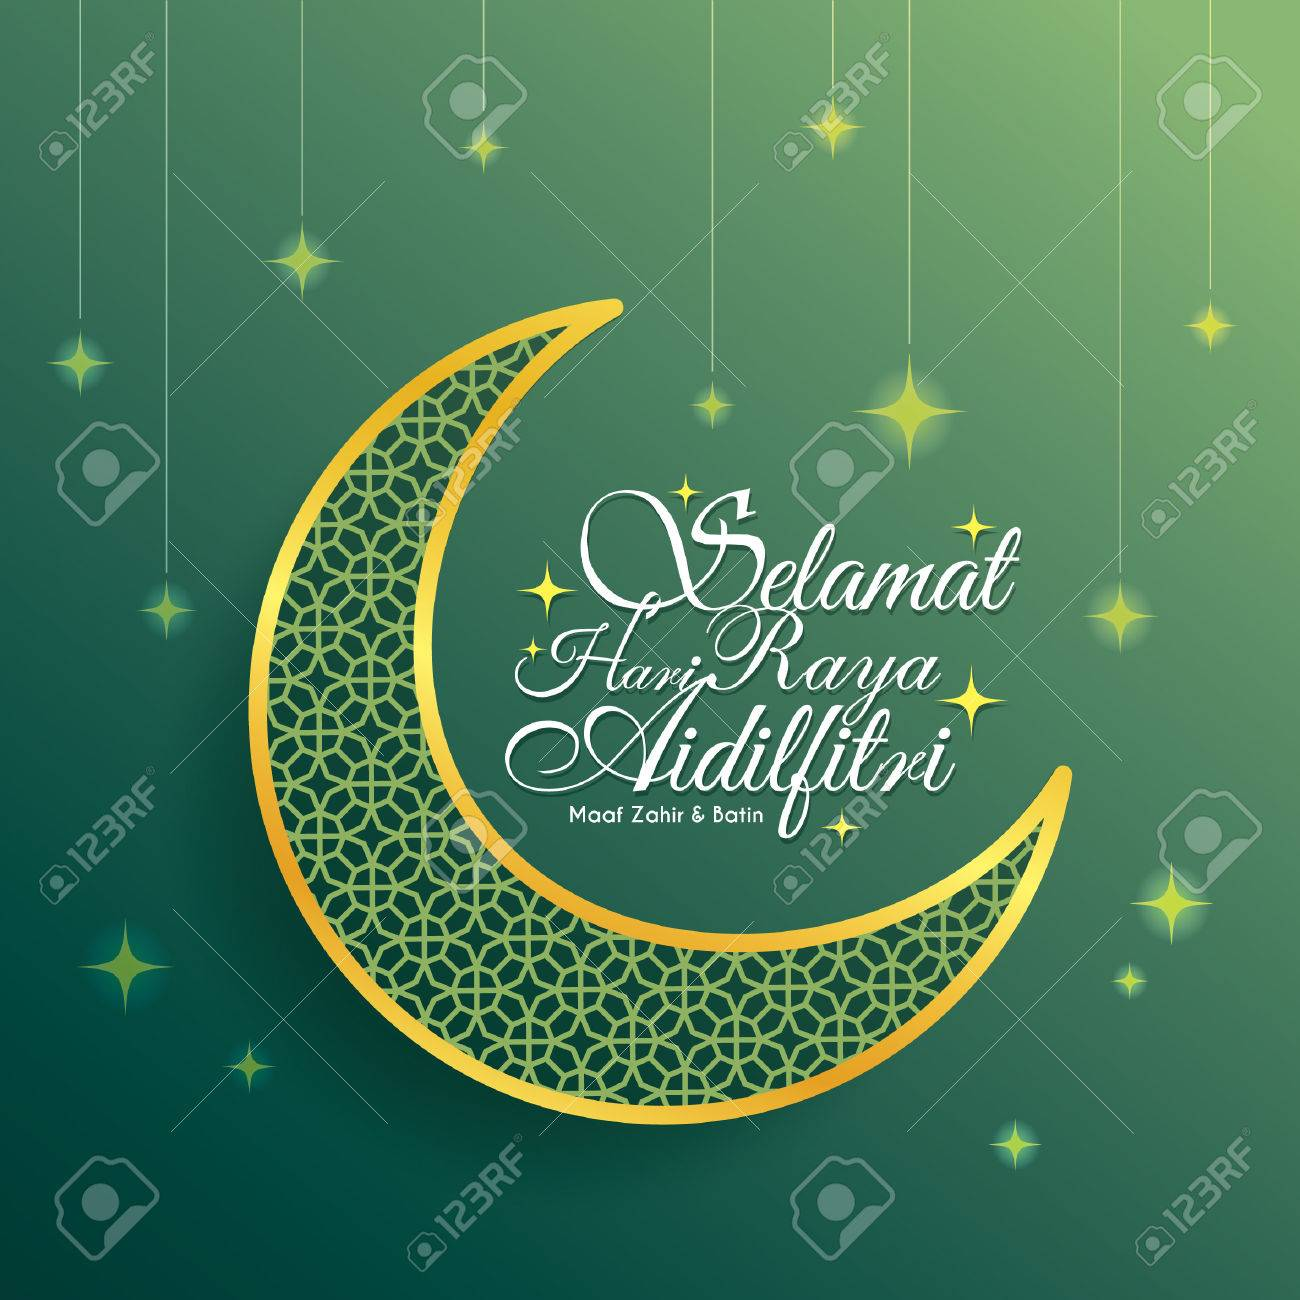 Hari raya greeting card with decorative crescent moon and starry hari raya greeting card with decorative crescent moon and starry green background vector illustration kristyandbryce Image collections